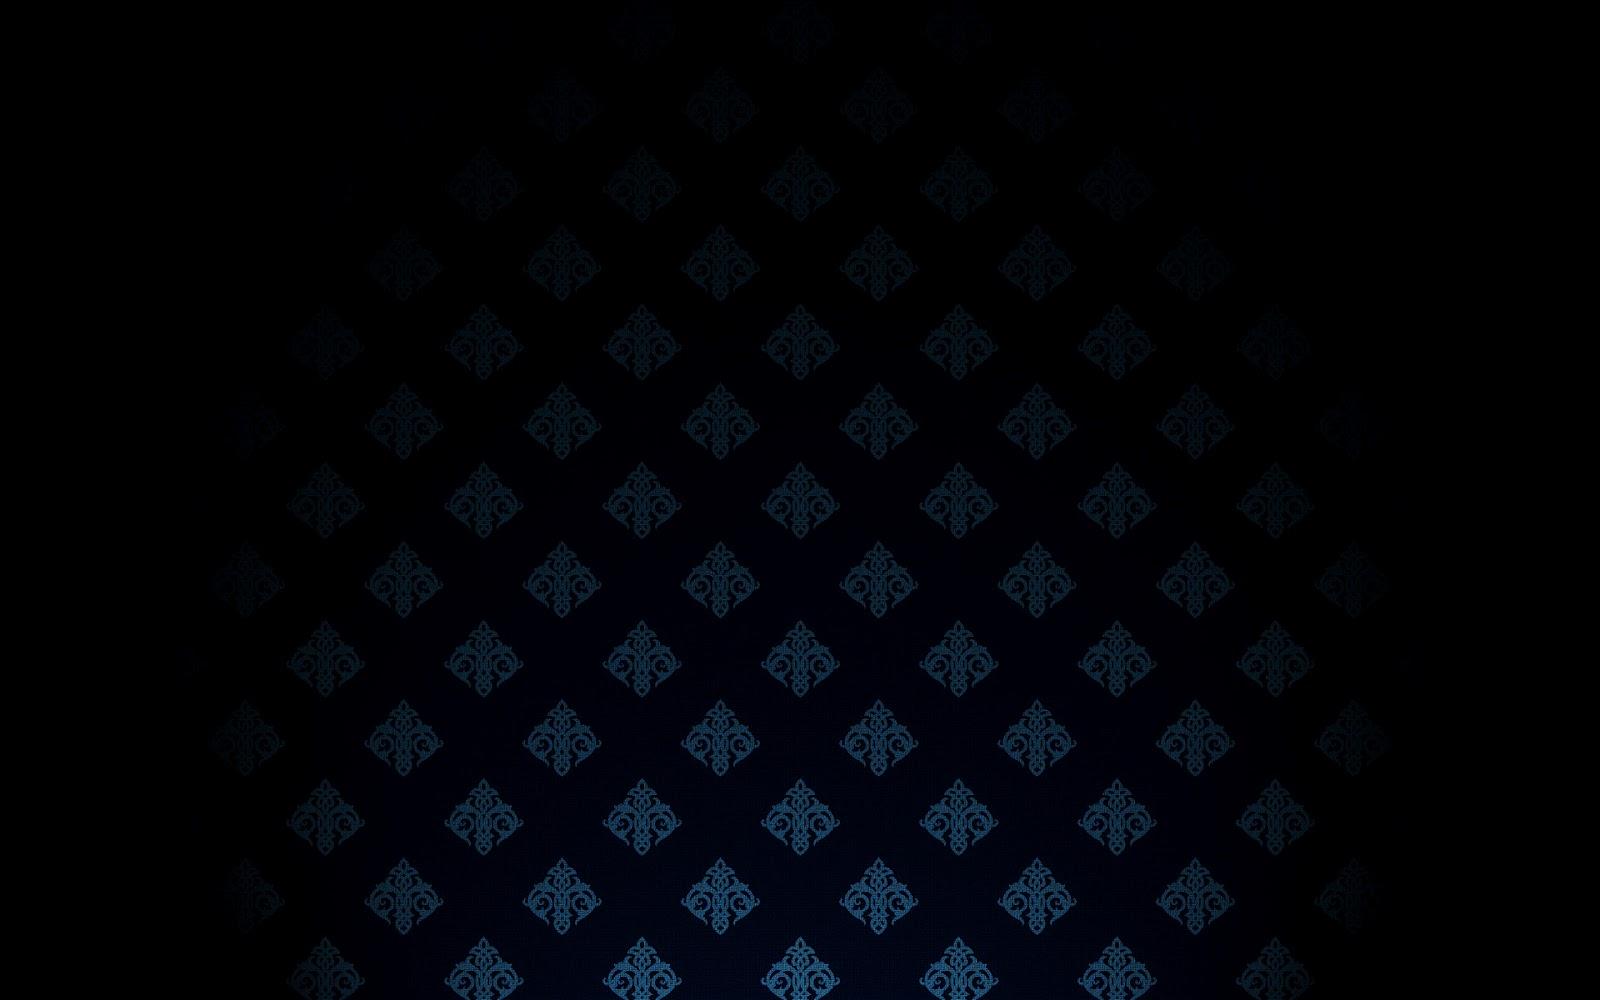 http://1.bp.blogspot.com/-odmV0u_3Bpo/T-Rf7i5BTCI/AAAAAAAAARg/As5XRORyuF8/s1600/background+wallpaper+fghr.jpg